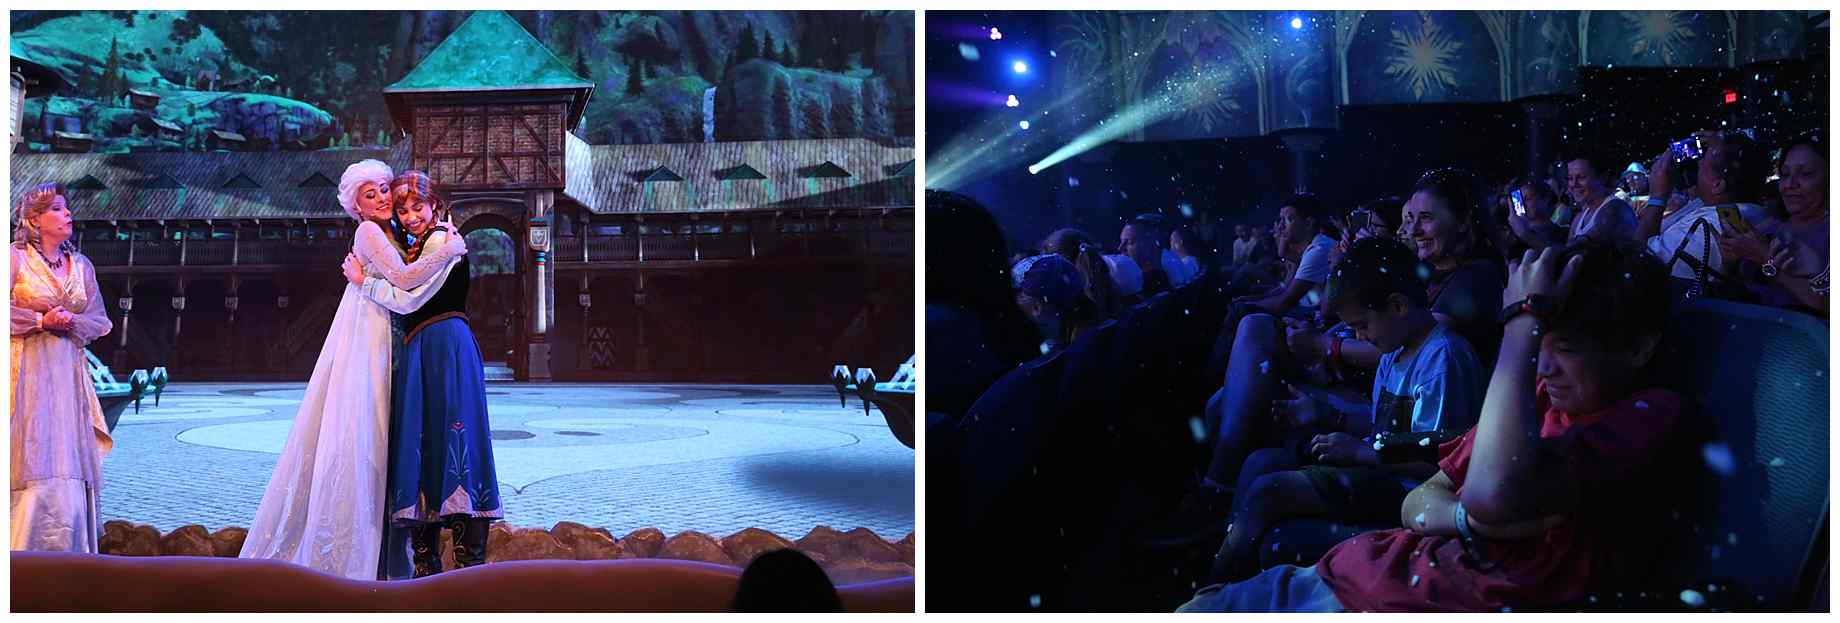 Disney-World-2015-024